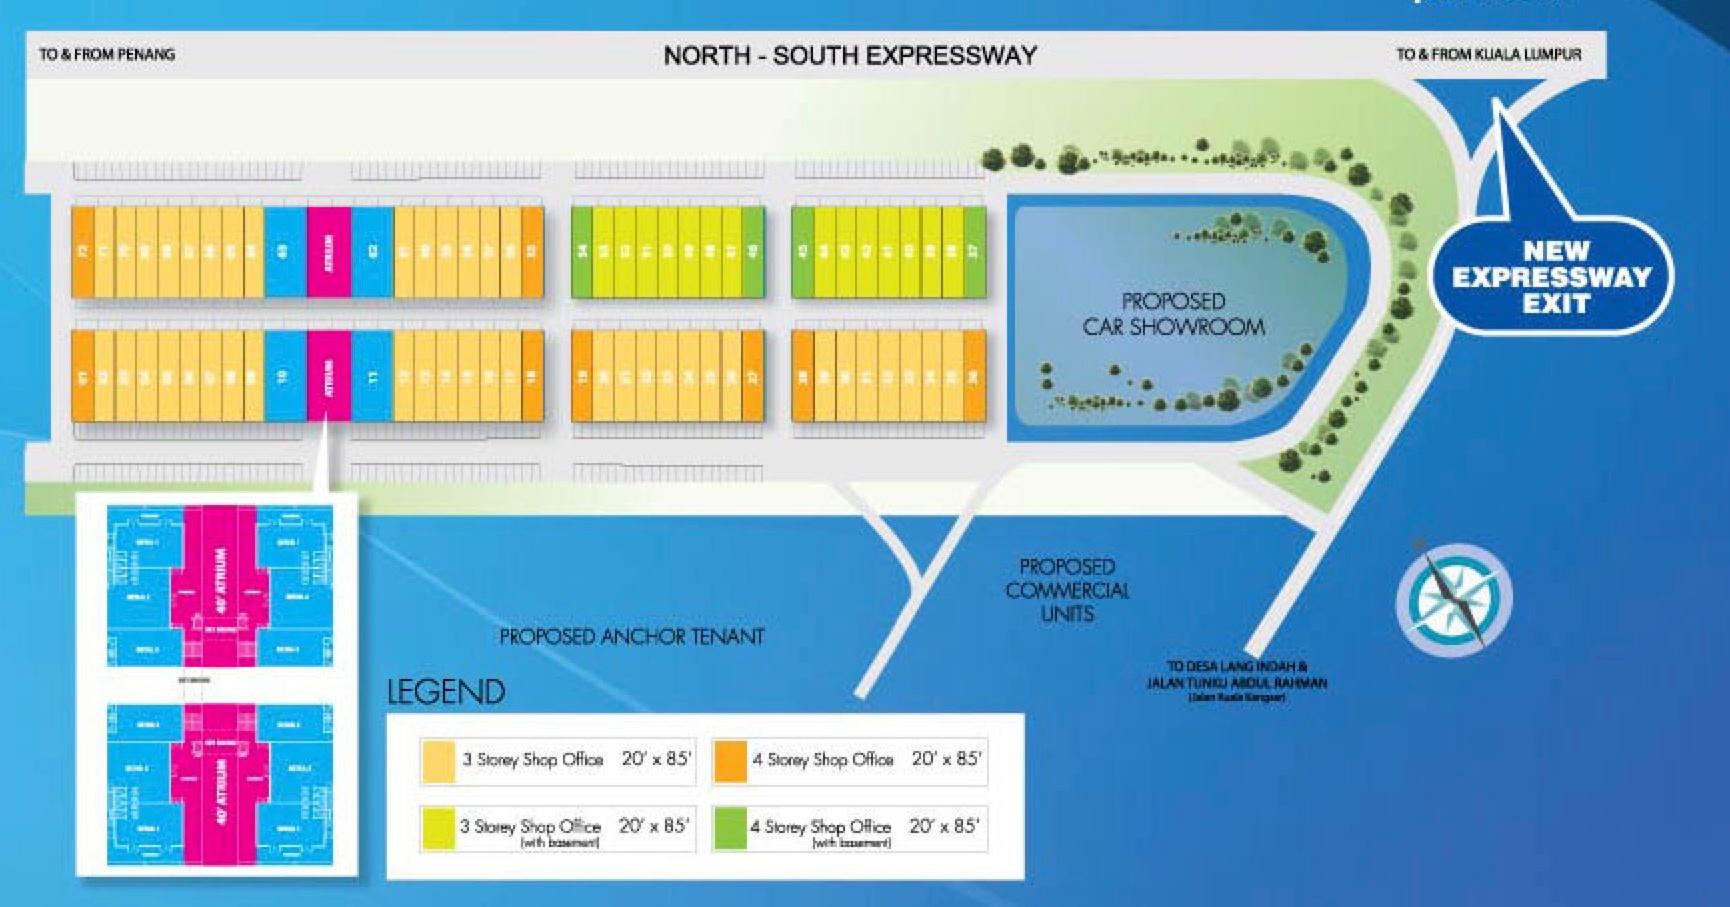 Site Plan of Atrio @ Lang Valley